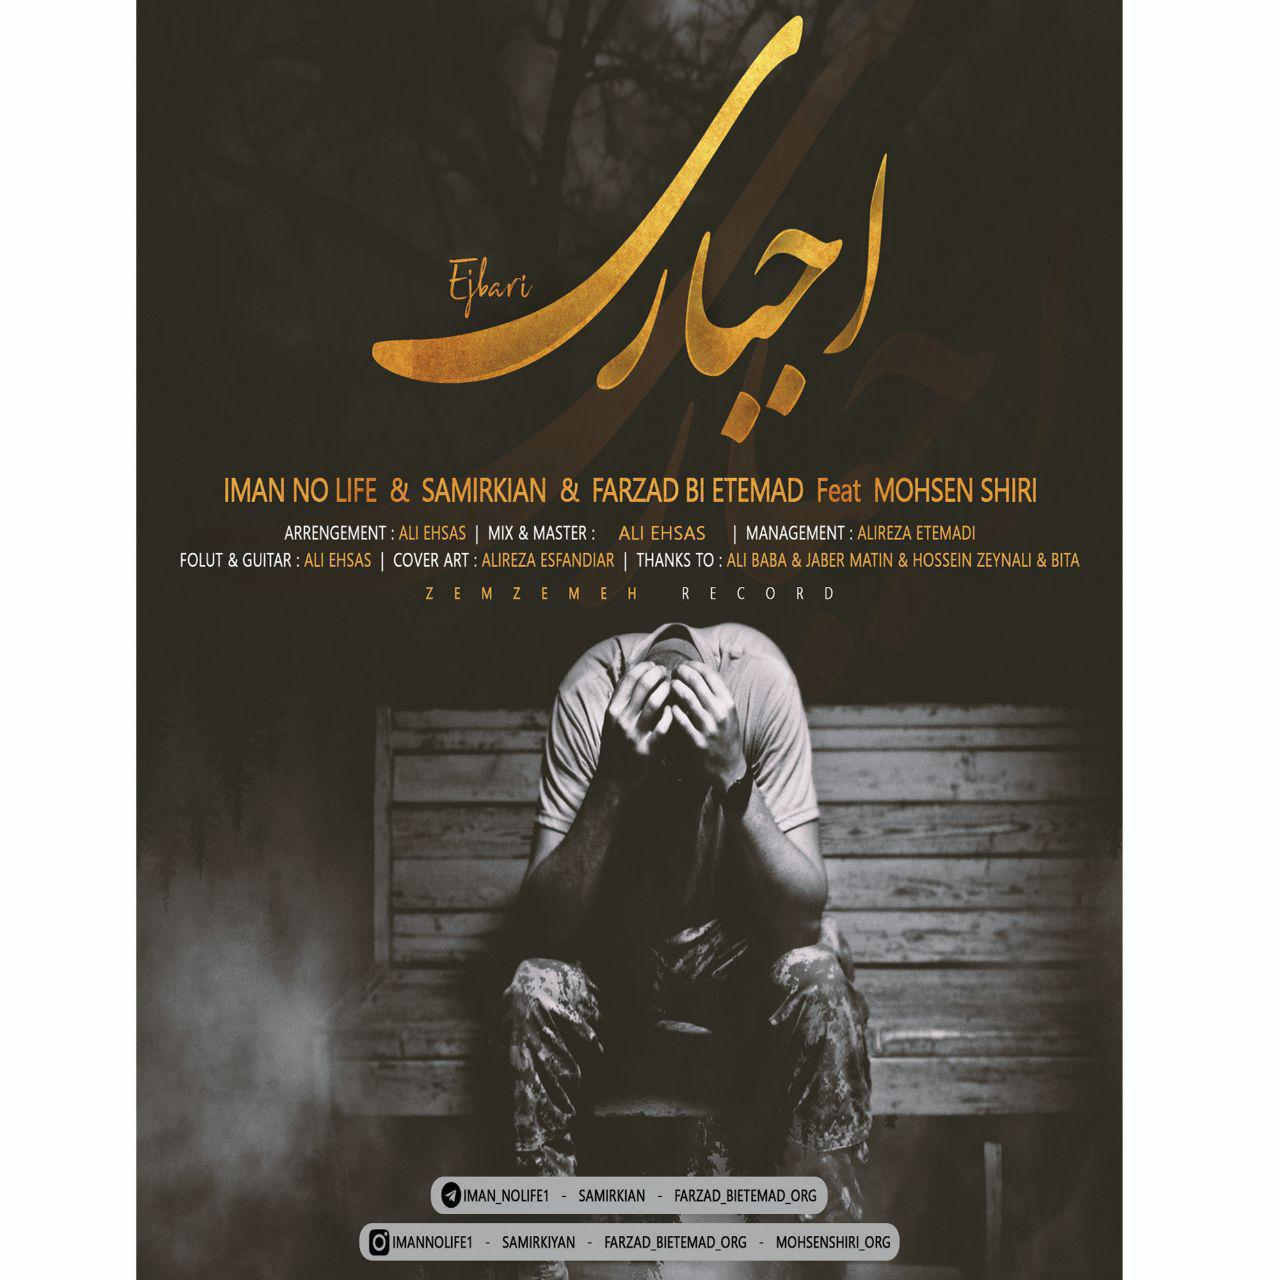 Iman Nolife – Ejbari (Ft Samir Kian And Farzad Bi Etemad And Mohsen Shiri)